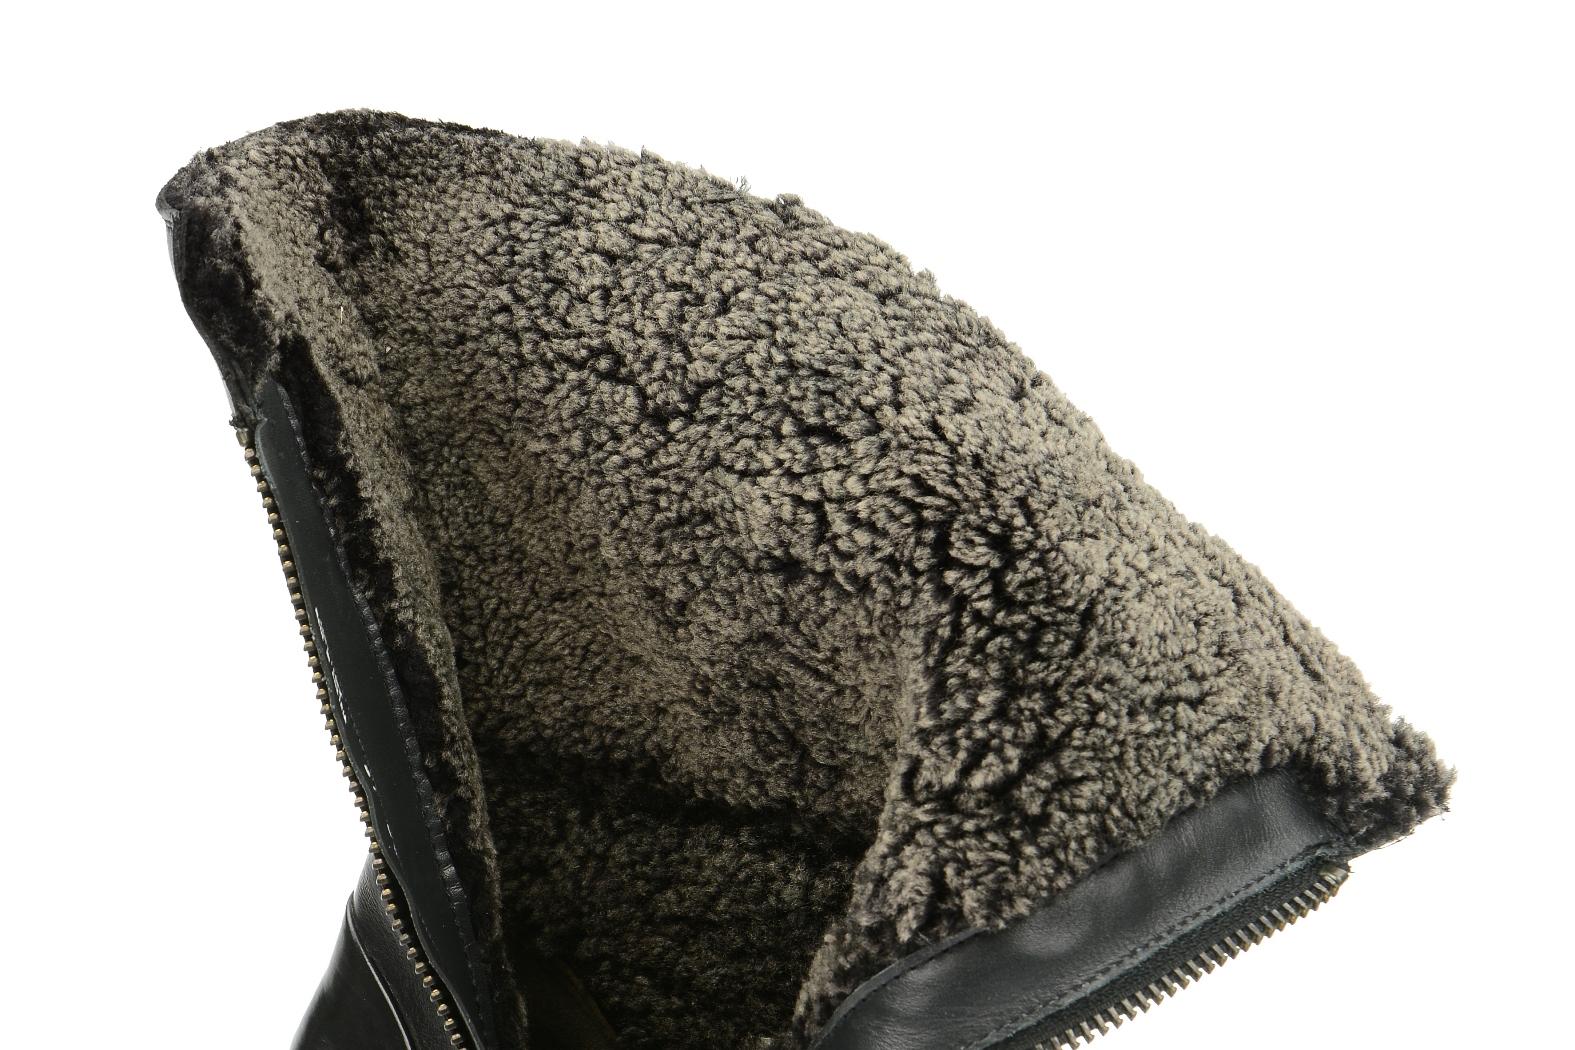 paul green 8437 004 stiefel schwarz high heels schuhhaus. Black Bedroom Furniture Sets. Home Design Ideas